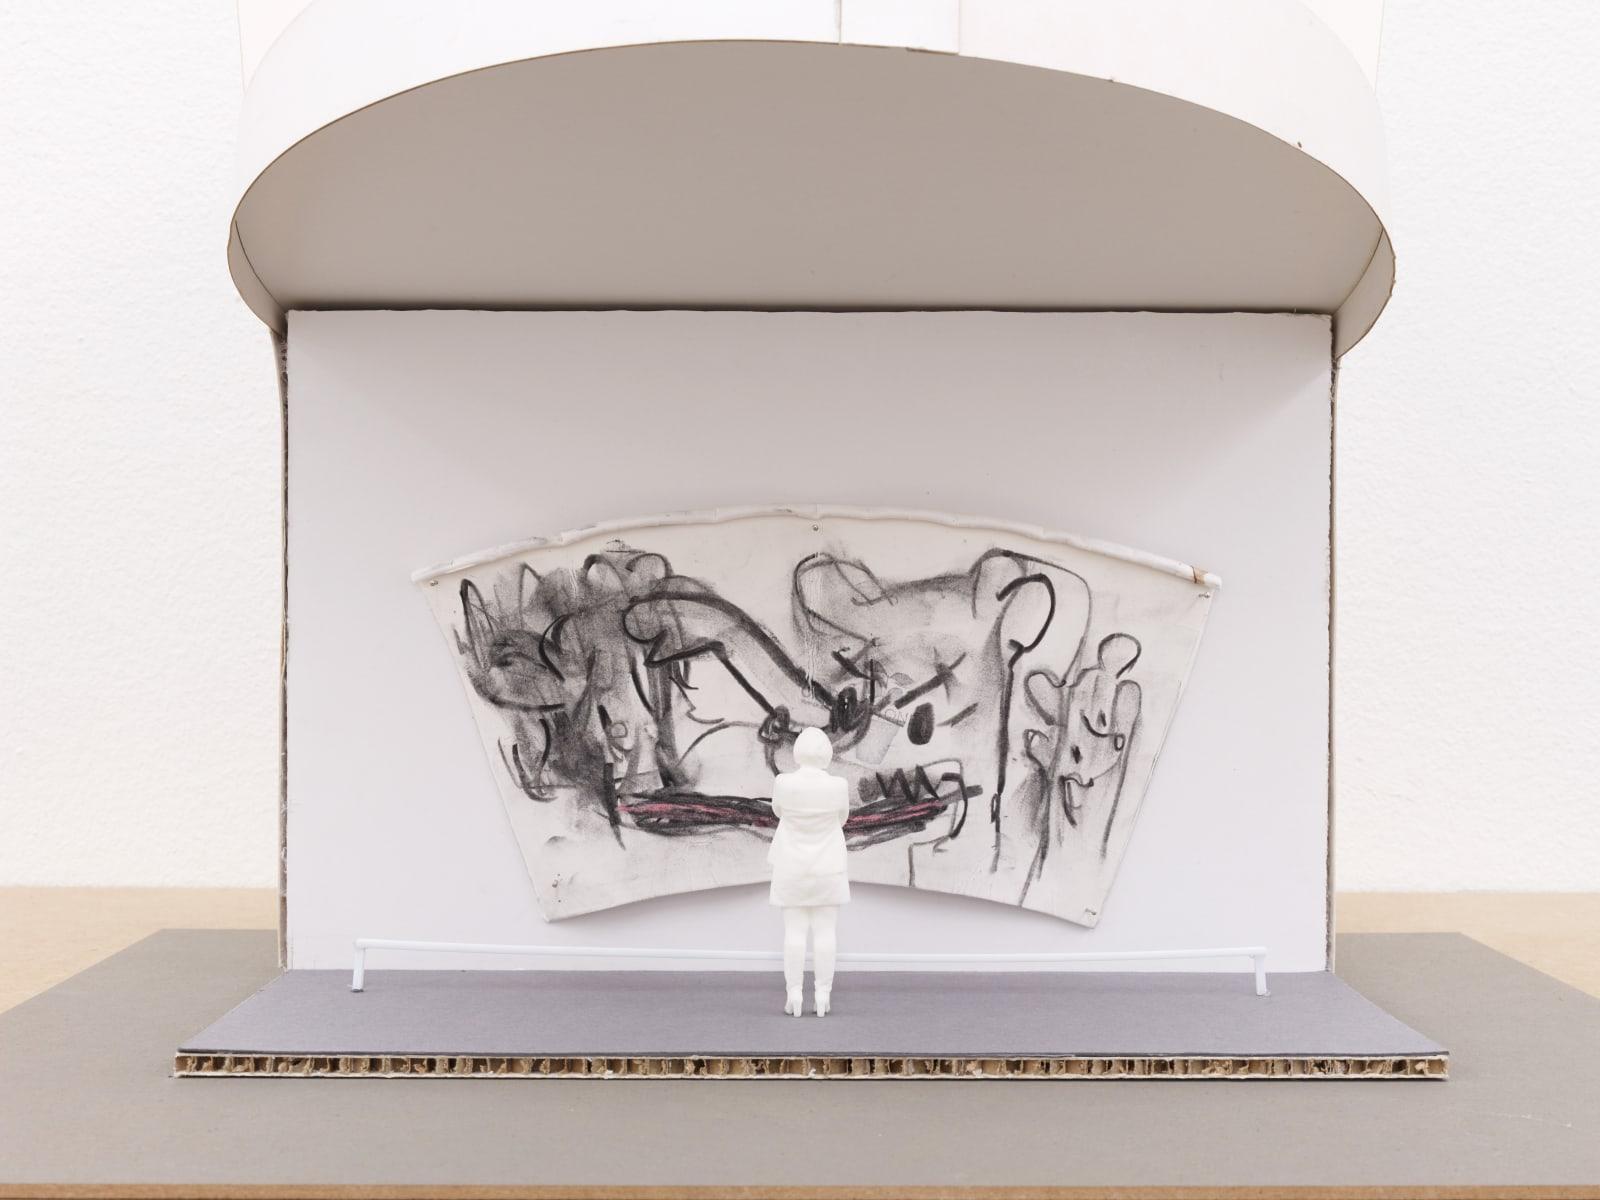 Who's Latte? (War), detail, 2021, sculptural video installation